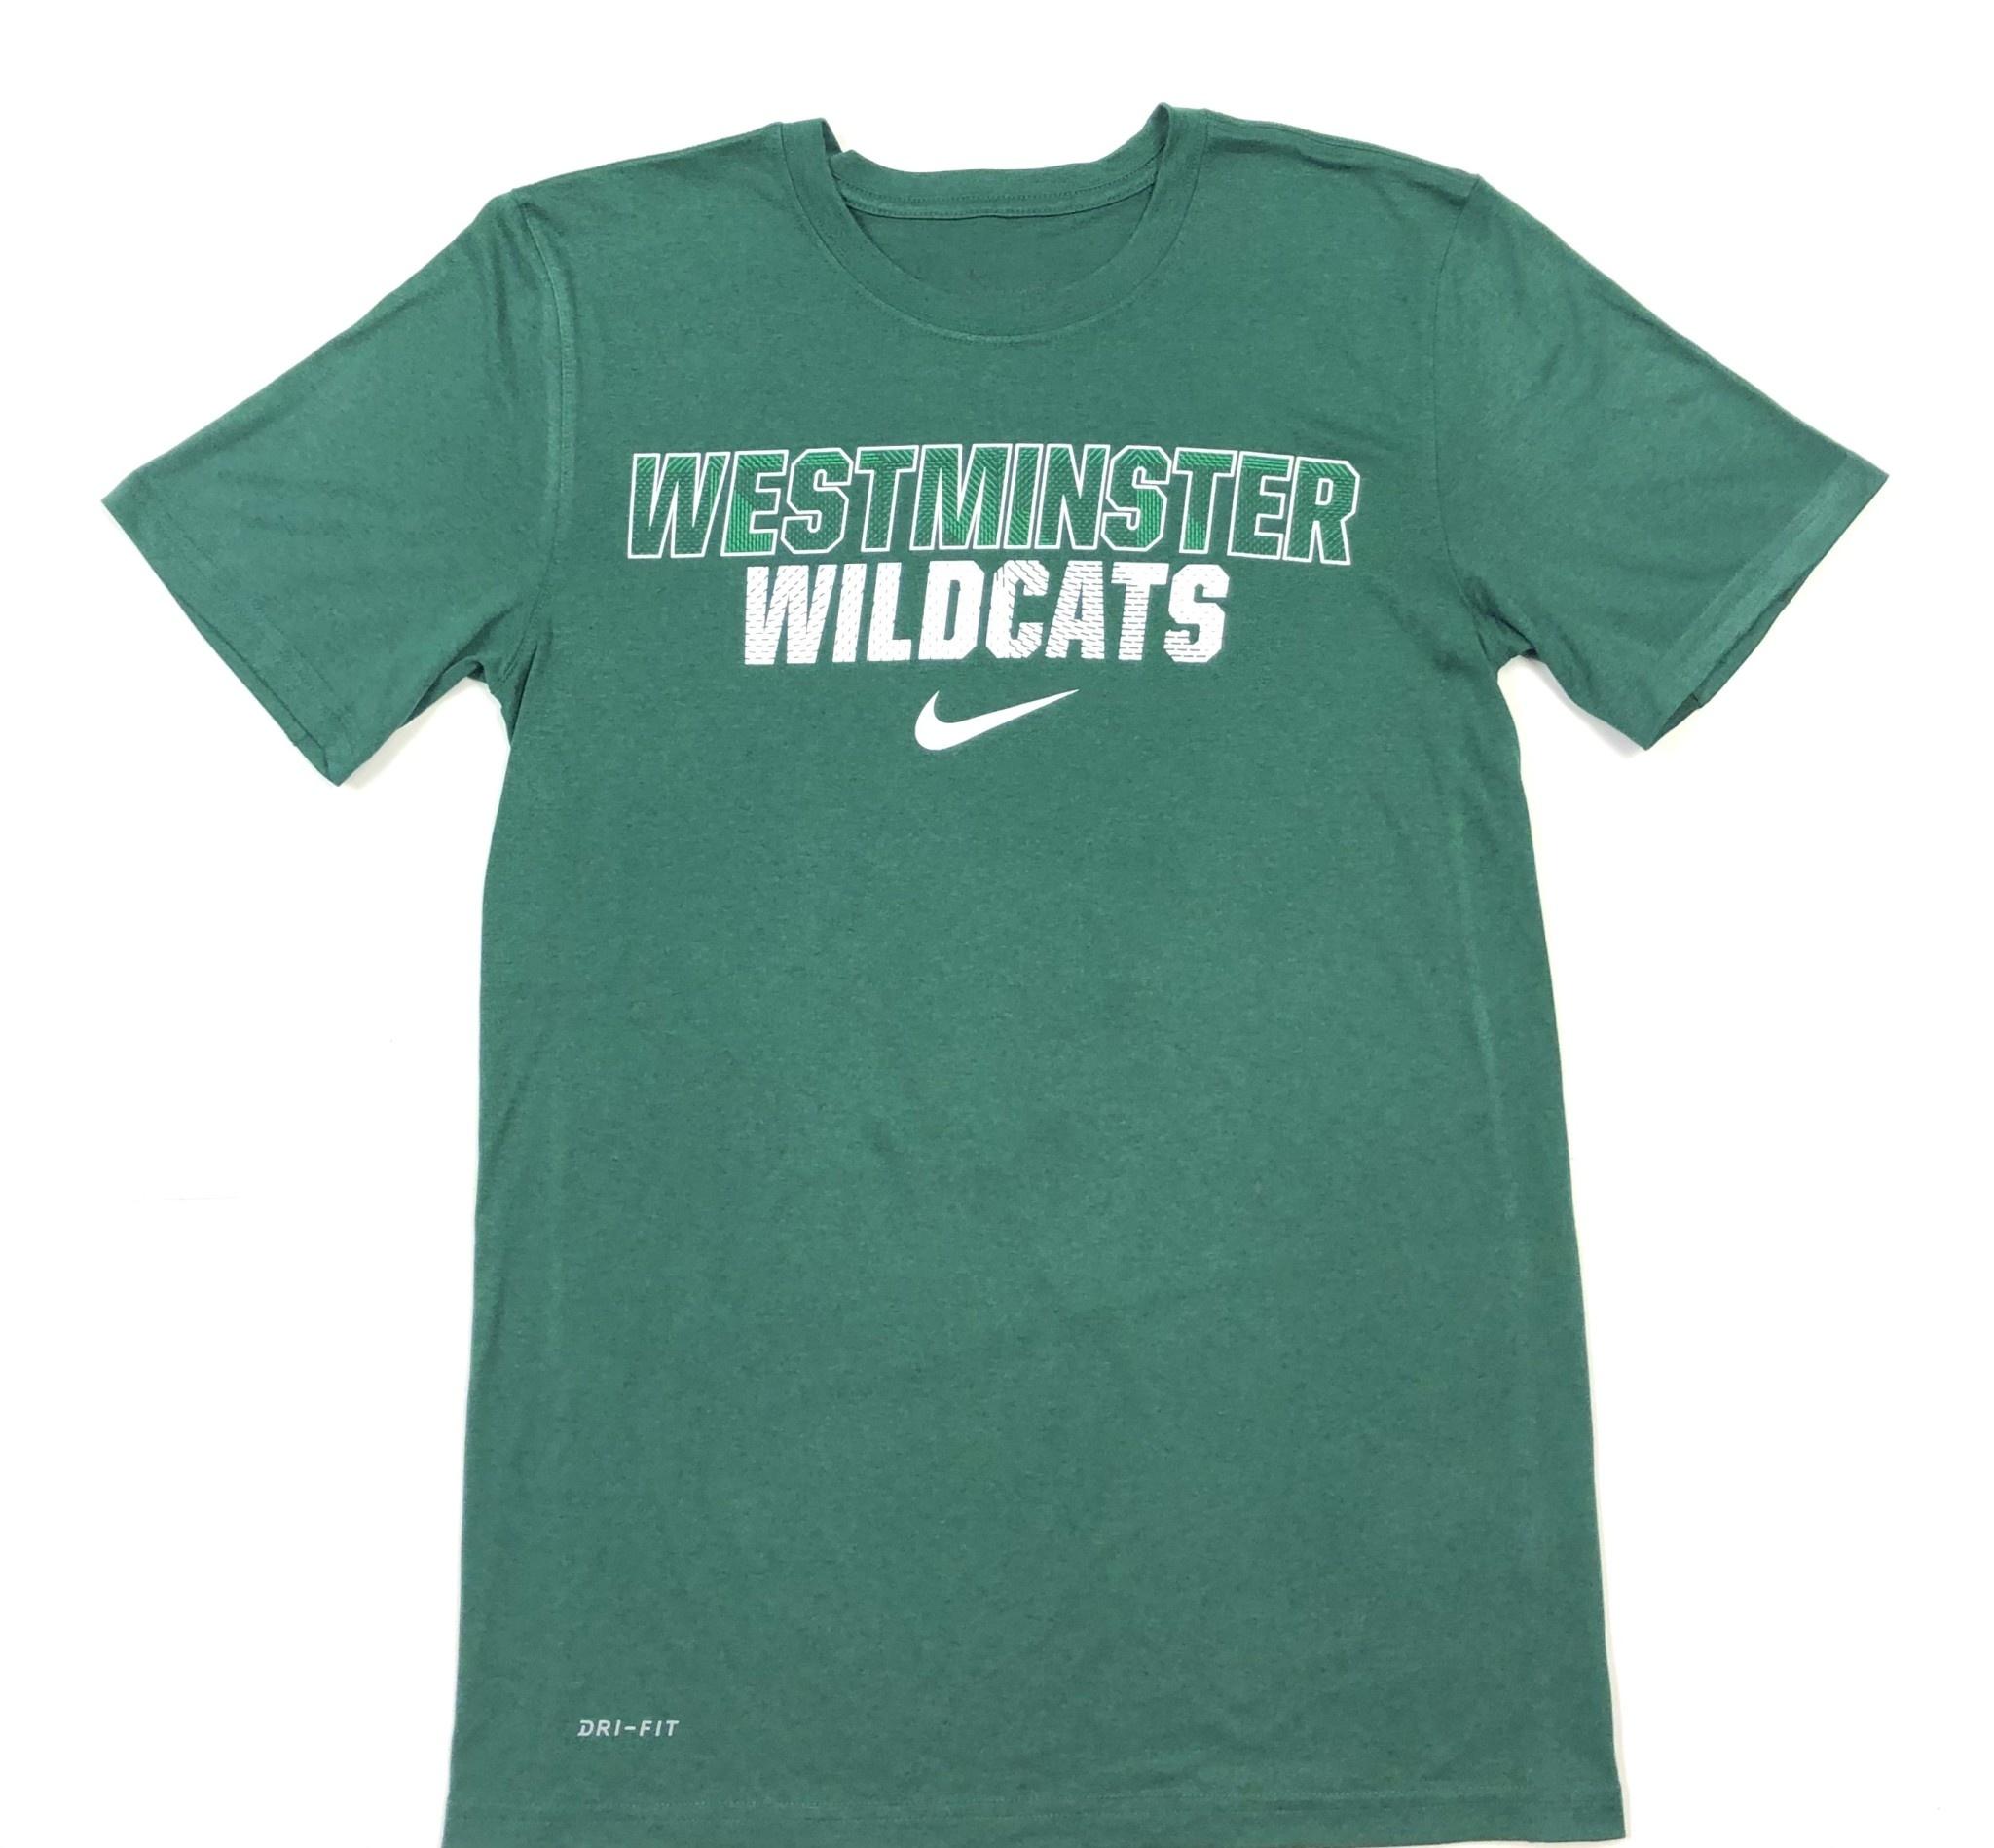 Nike T: Nike Legend SS Dri-fit Green w/Patterned Westminster Wildcats